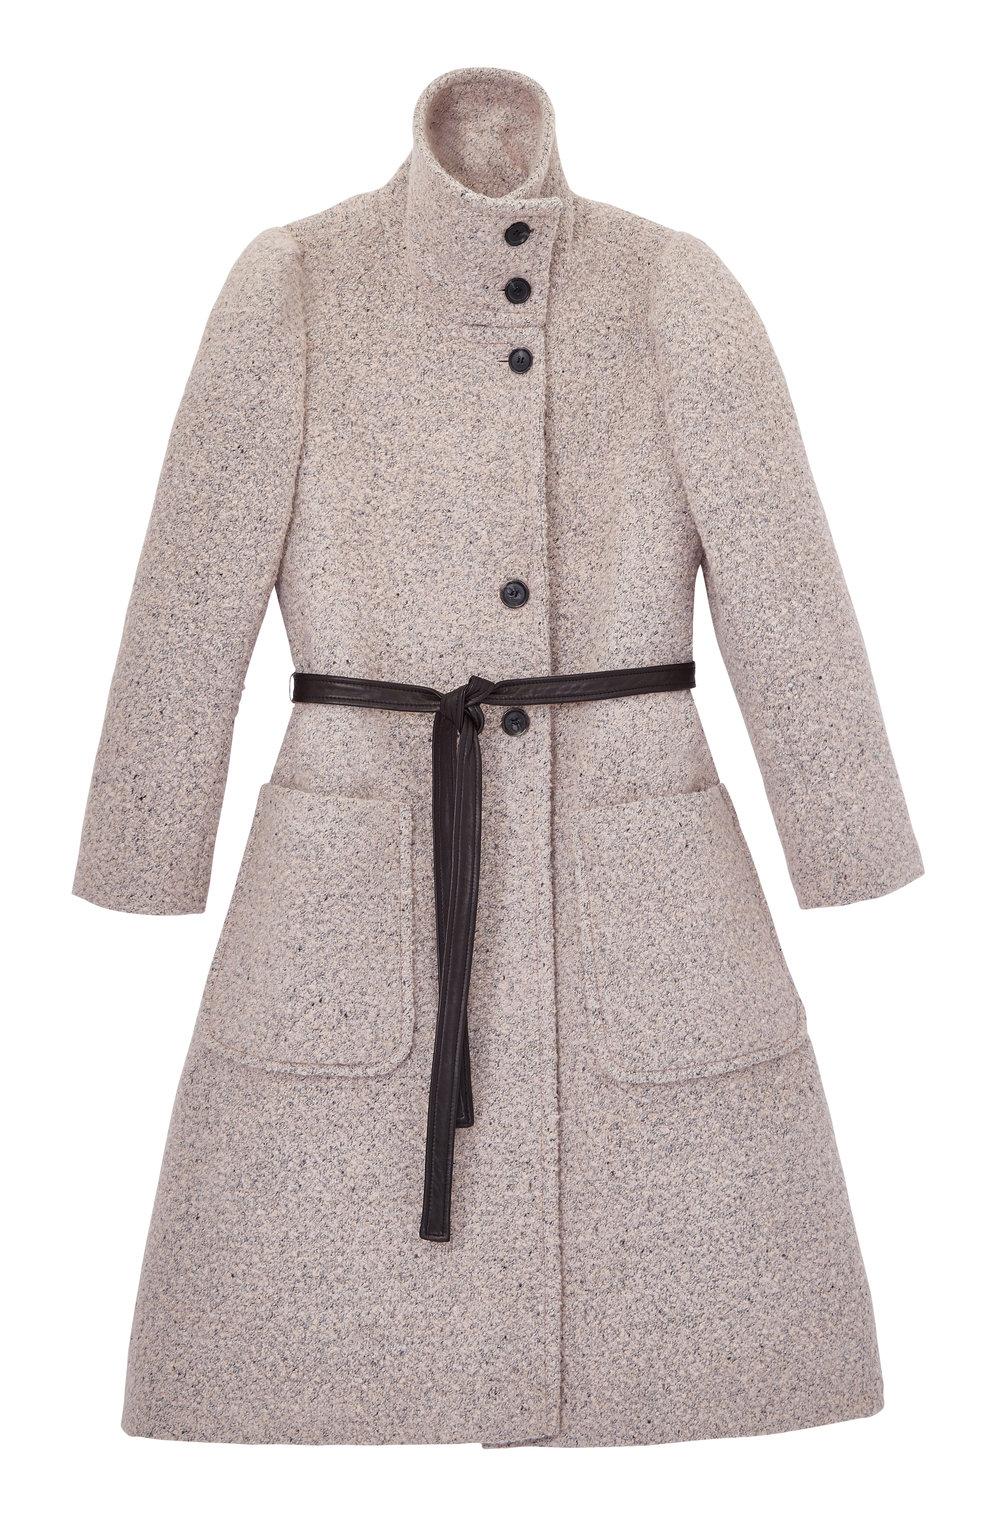 Rebecca Taylor Boucle Coat,$895, RebeccaTaylor.com